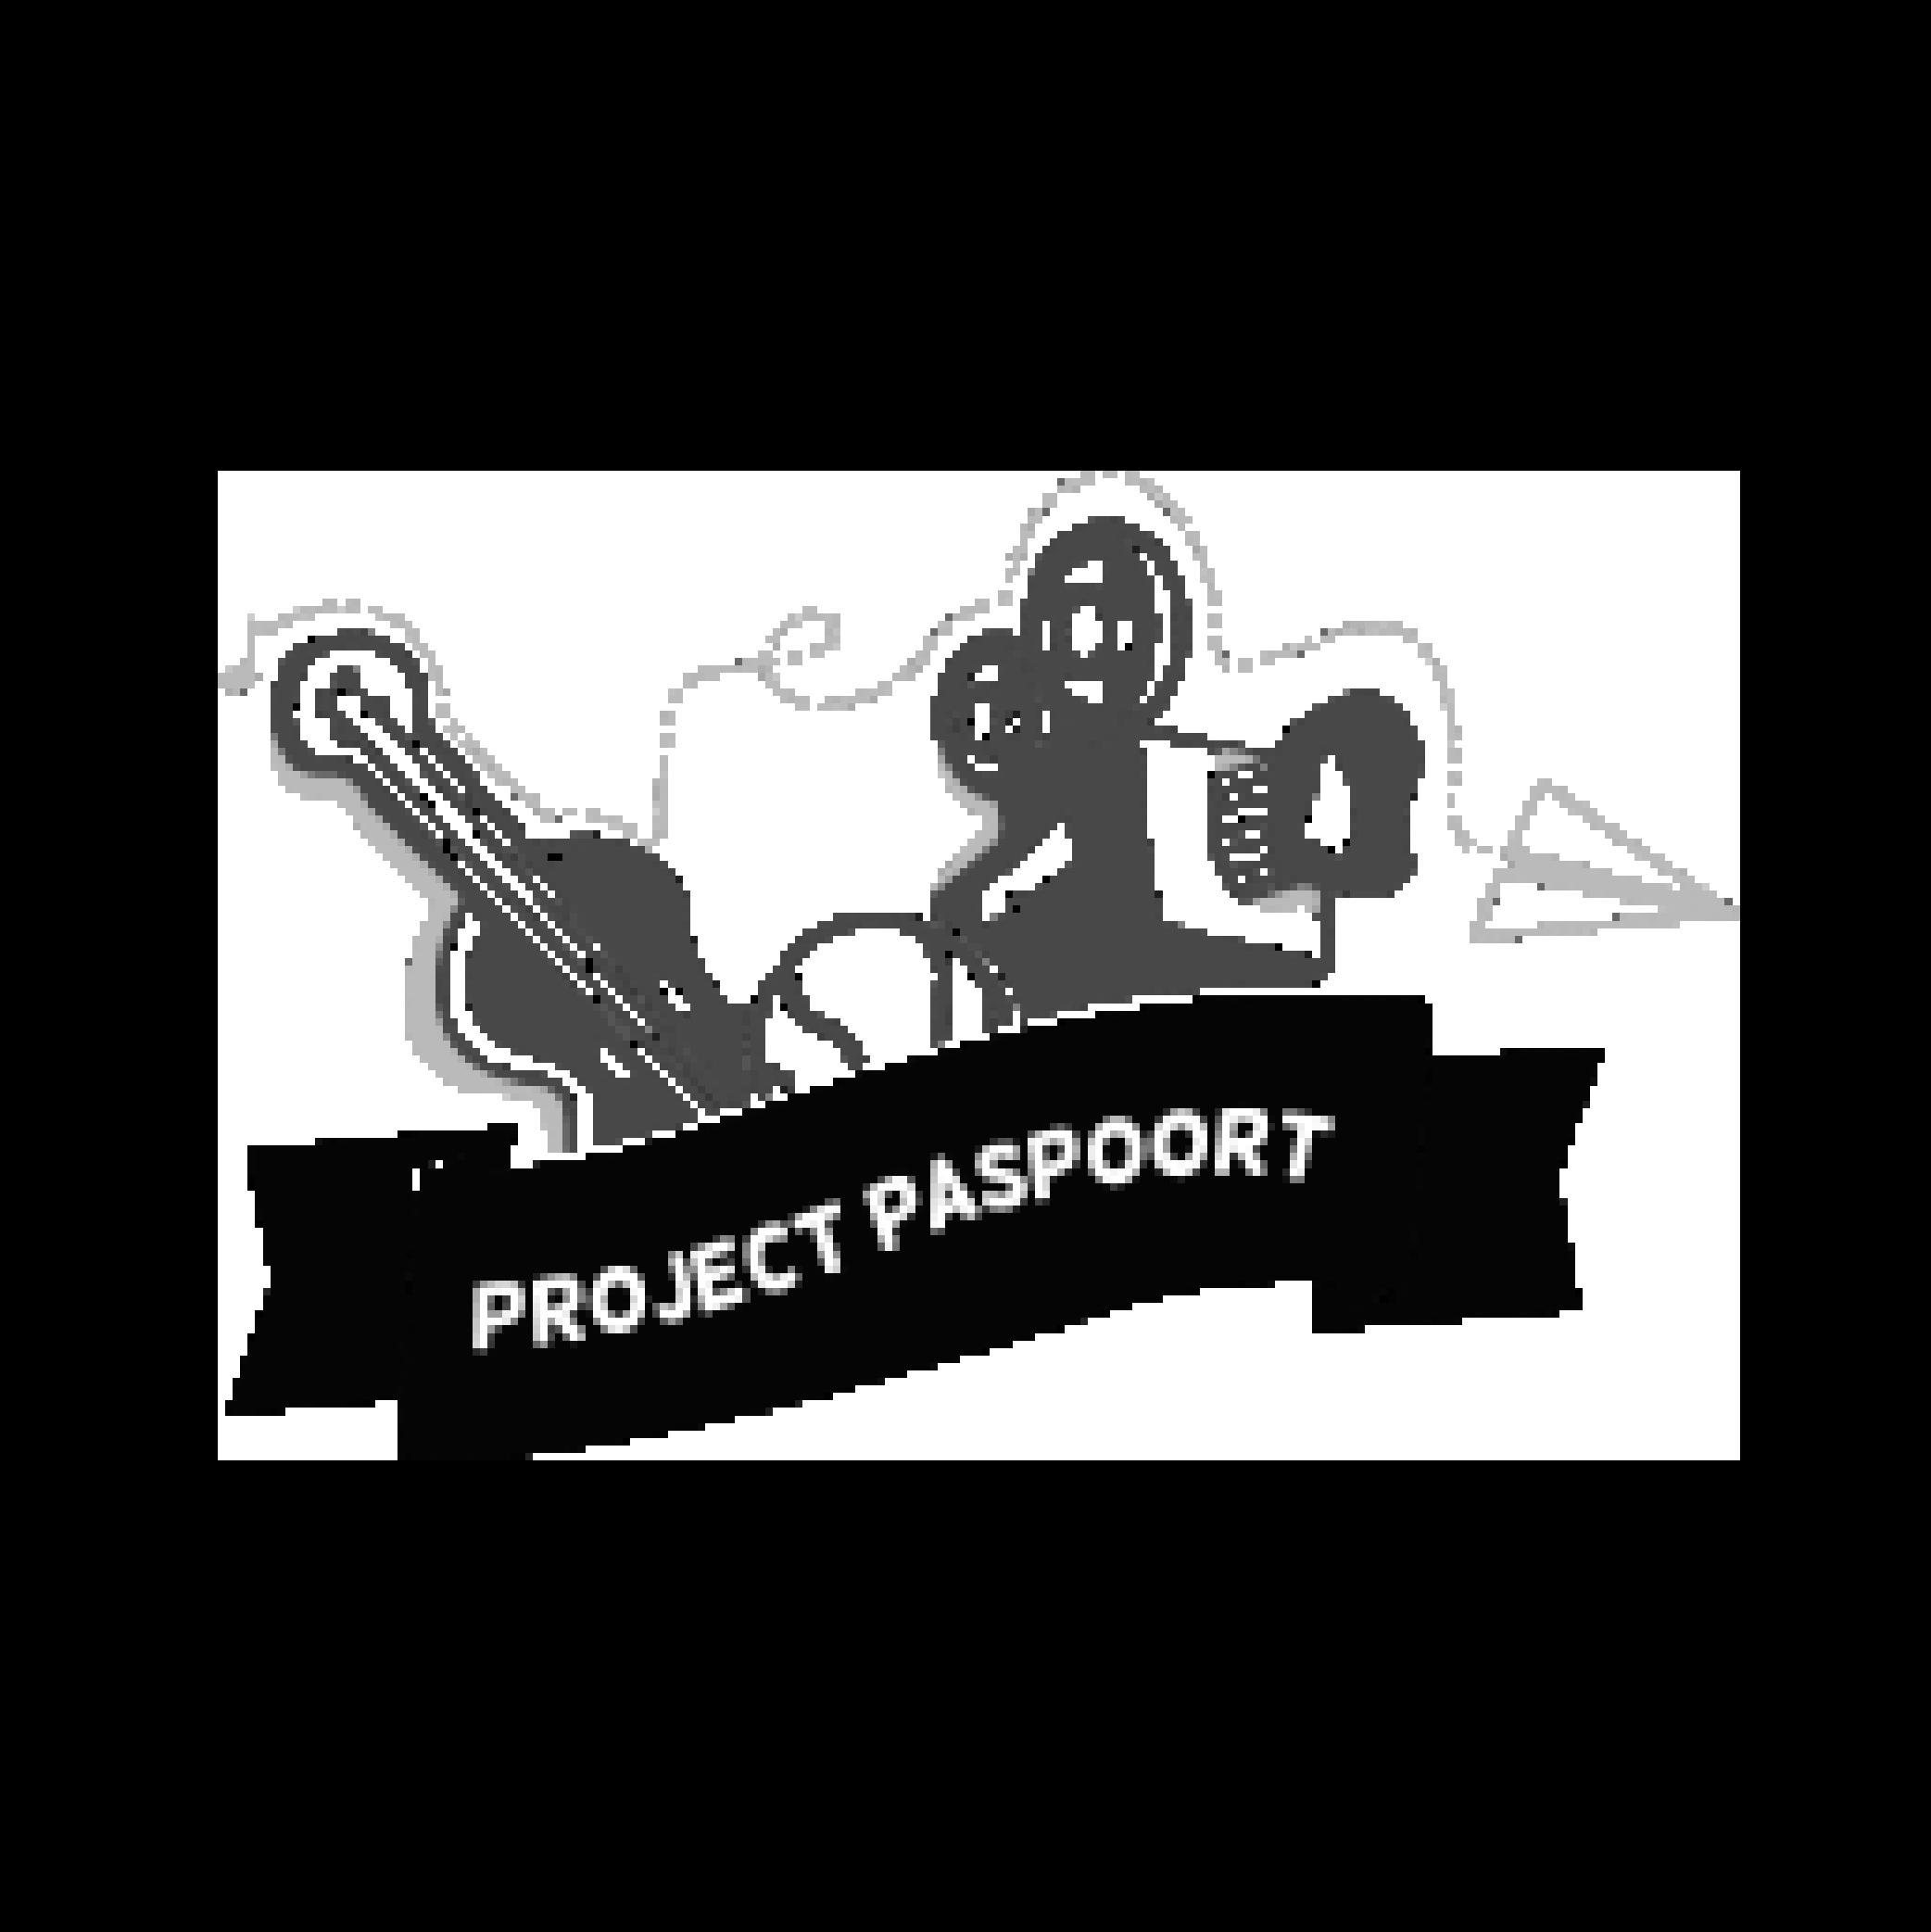 AD-Klant-ProjectPaspoort-bw